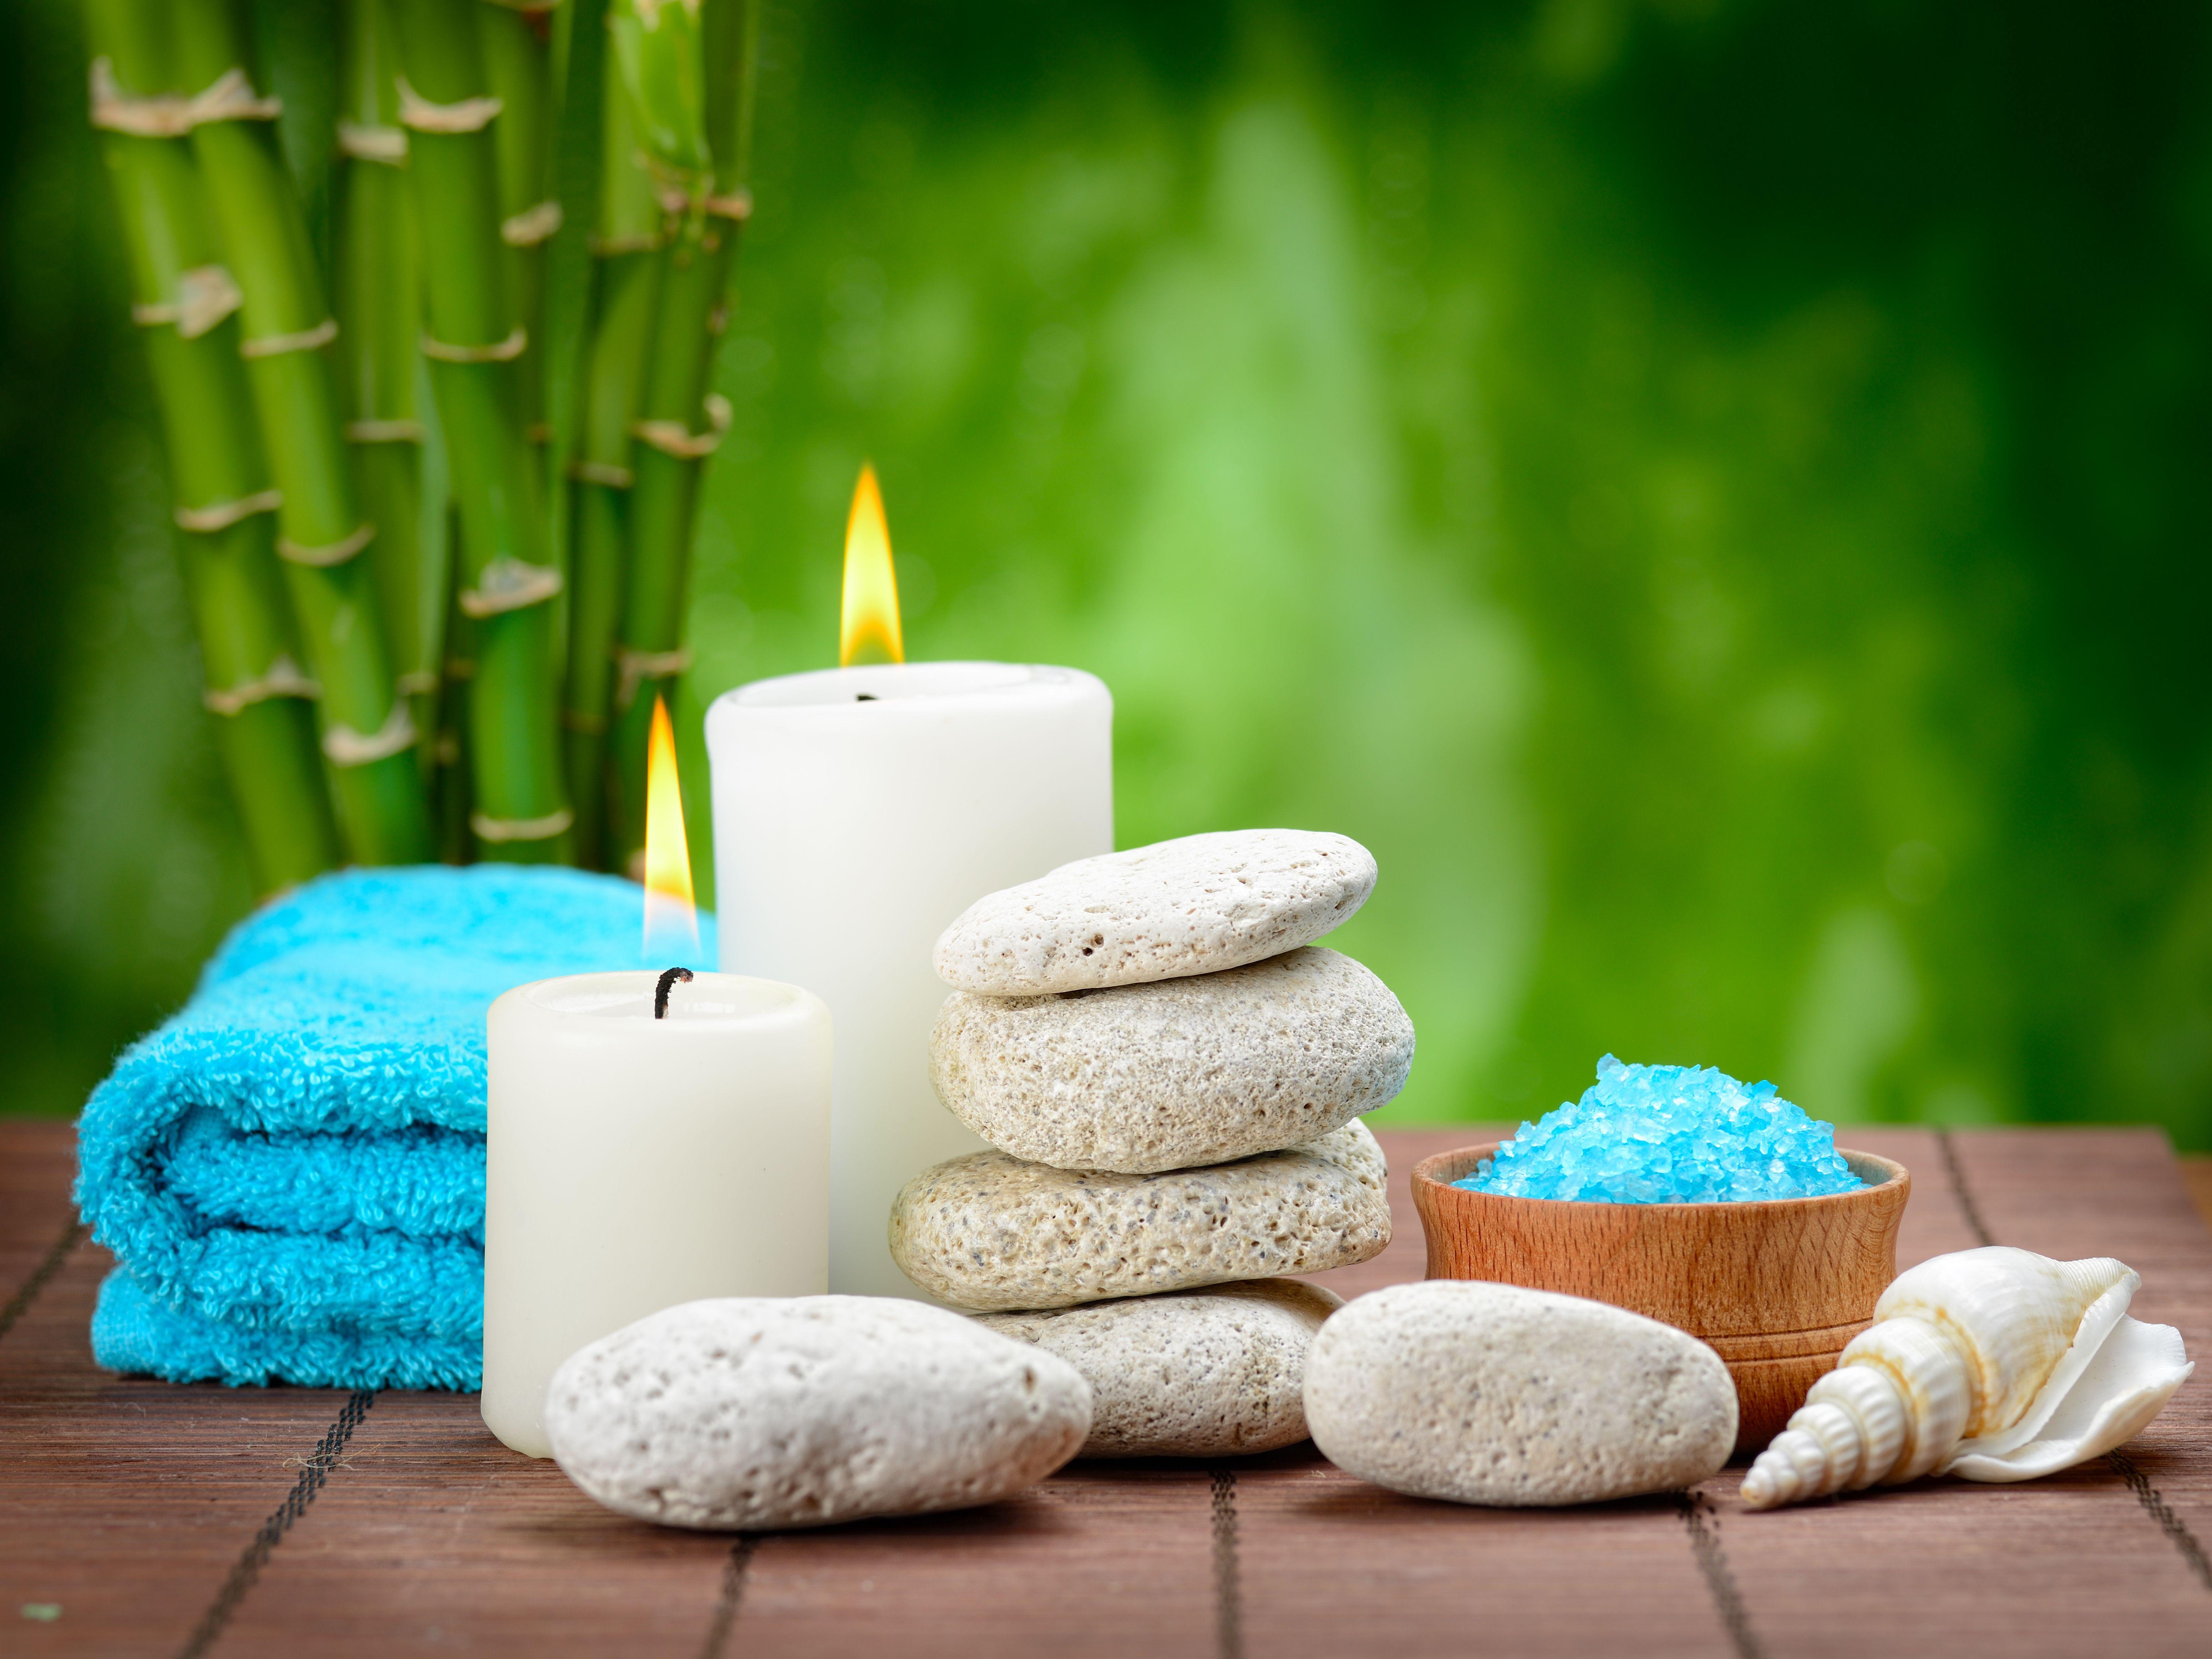 Wallpaper Spa Zen Stones Candles Bamboo Spa Stones